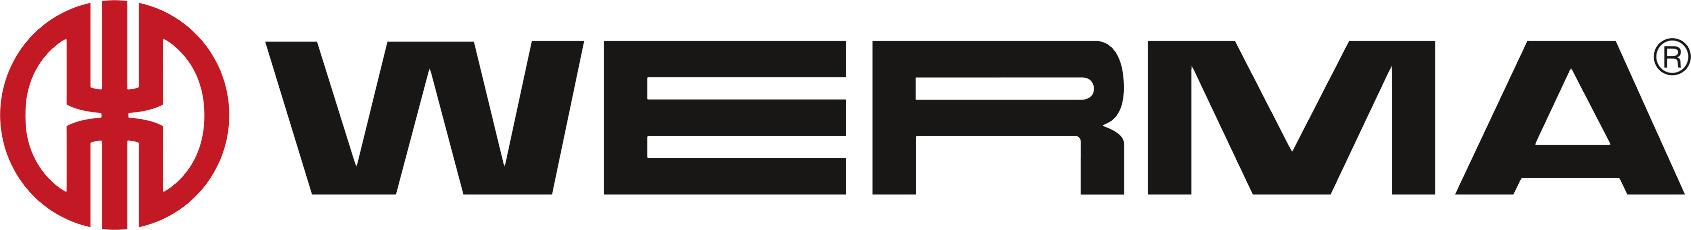 WERMA Signaltechnik GmbH + Co. KG